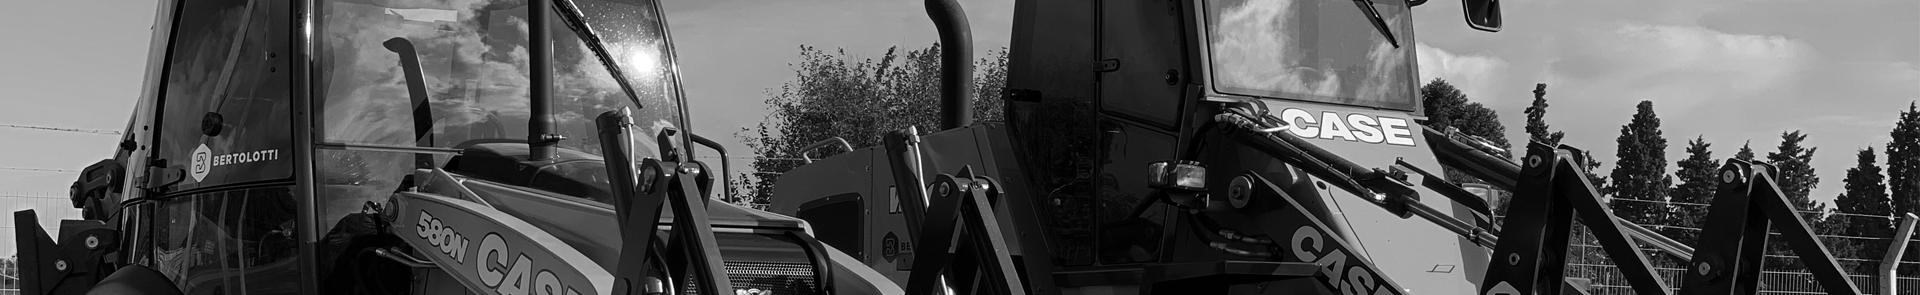 Alquiler de máquinas viales - Bertolotti